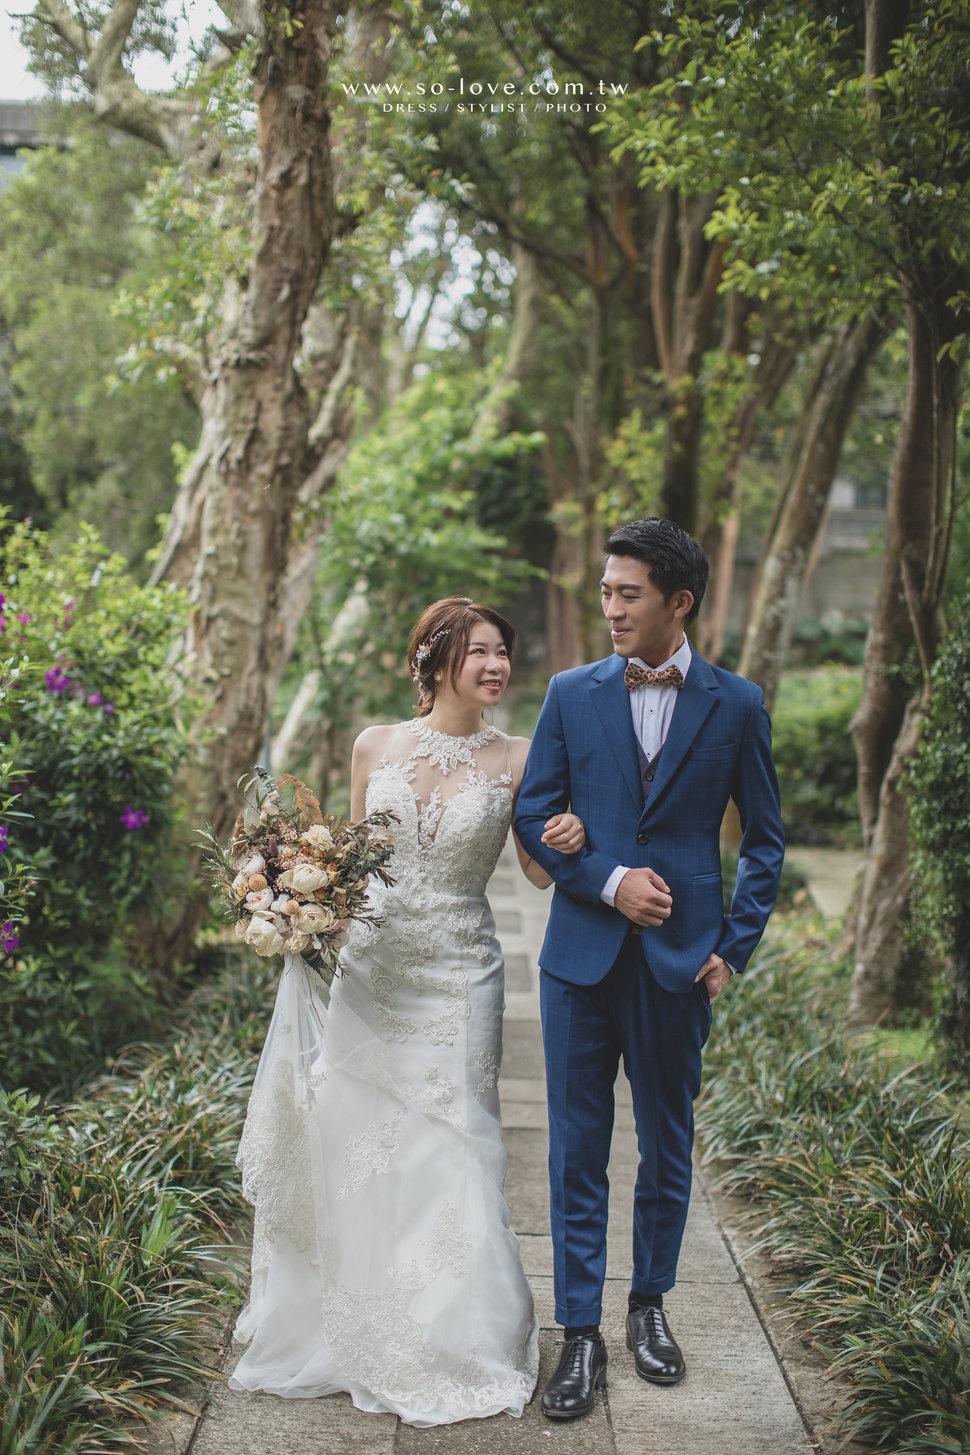 RYAN8082 - So.Love Wedding 樂樂蕾絲《結婚吧》